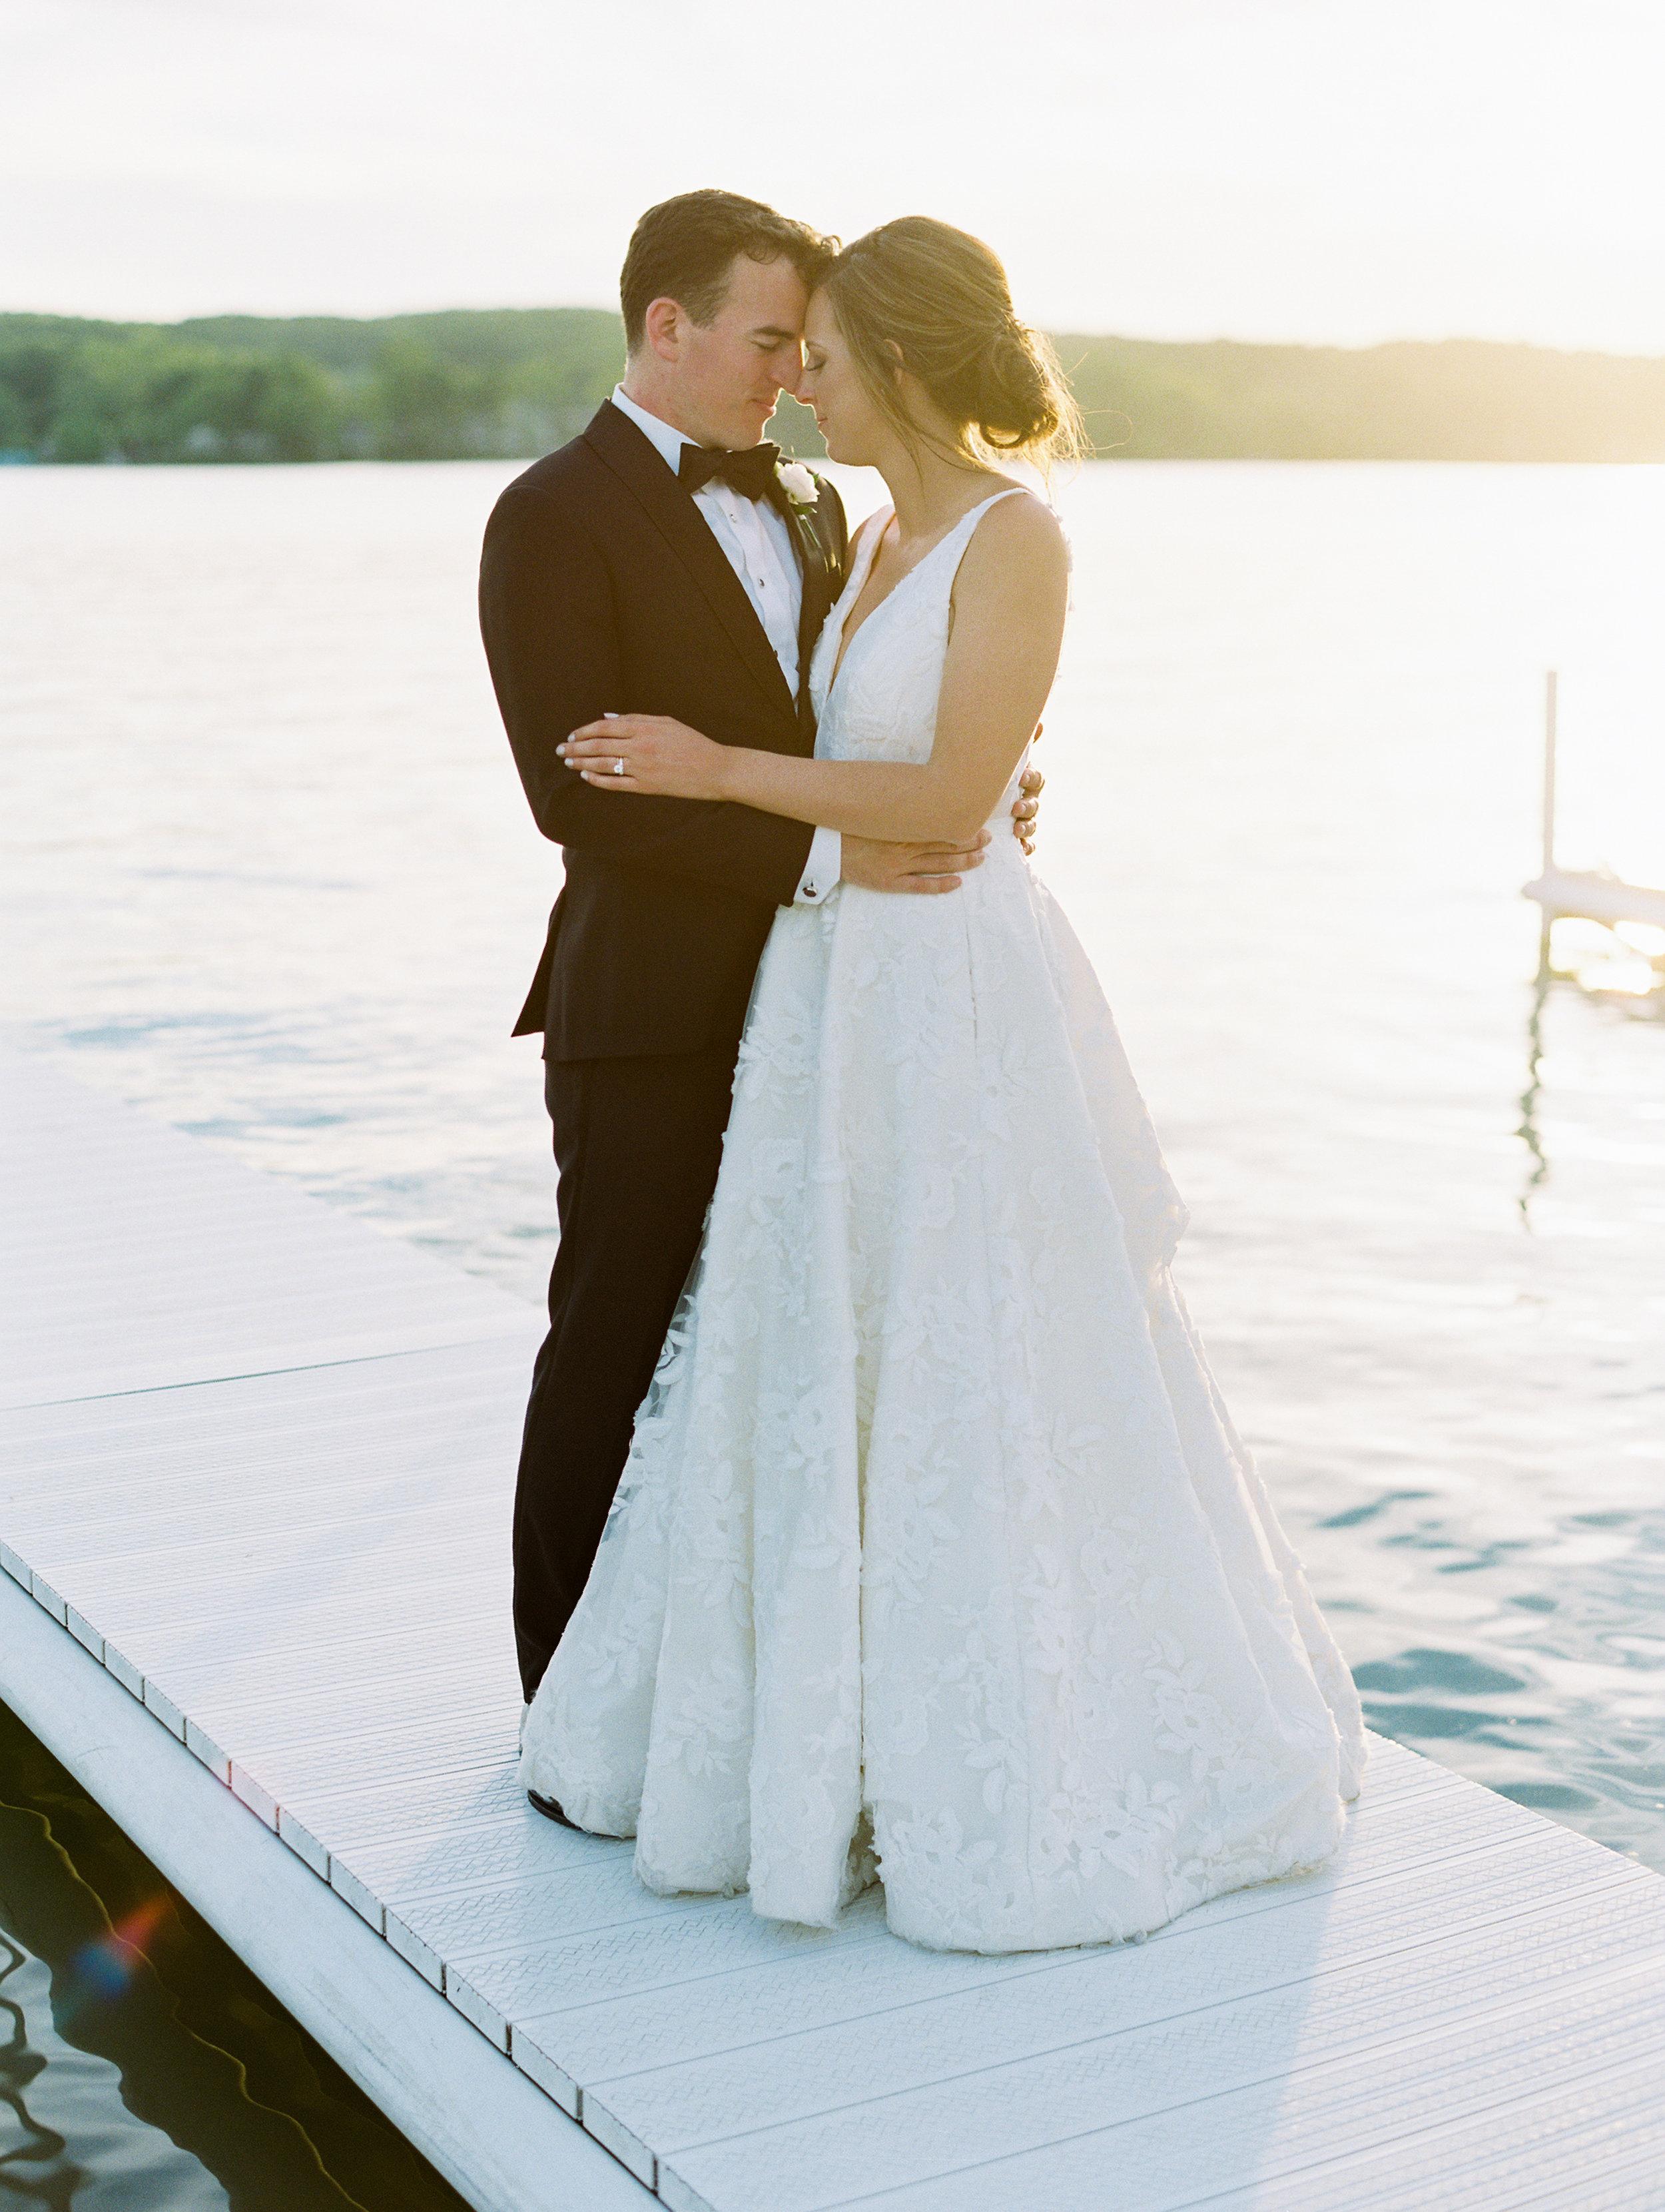 DeGuilio+Wedding+BrideGroomSunsetf-1.jpg